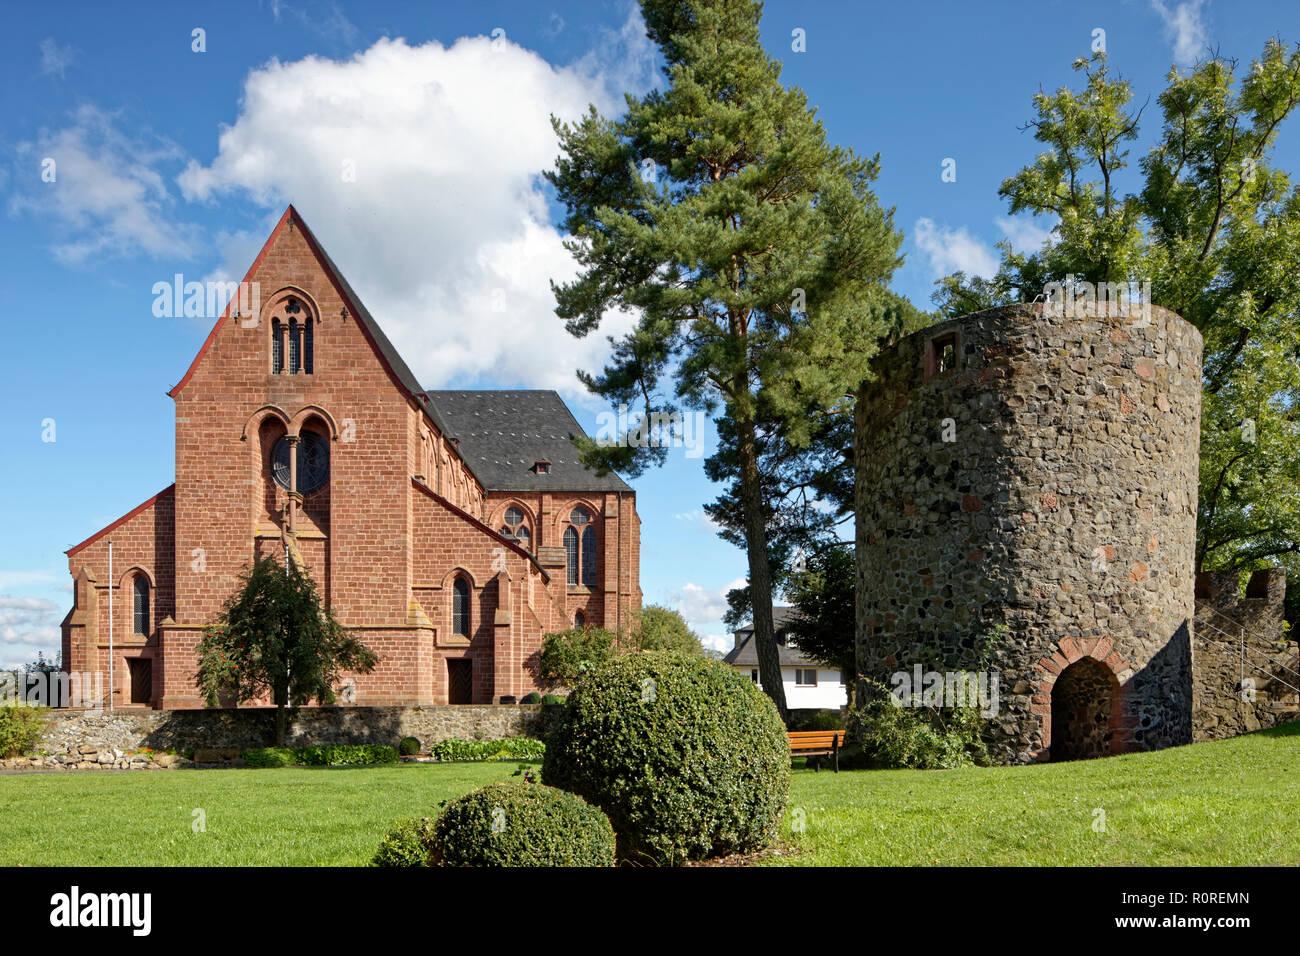 St. John the Baptist Church, Catholic parish church, Amöneburg castle ruins, defence defence tower, Amöneburg castle - Stock Image